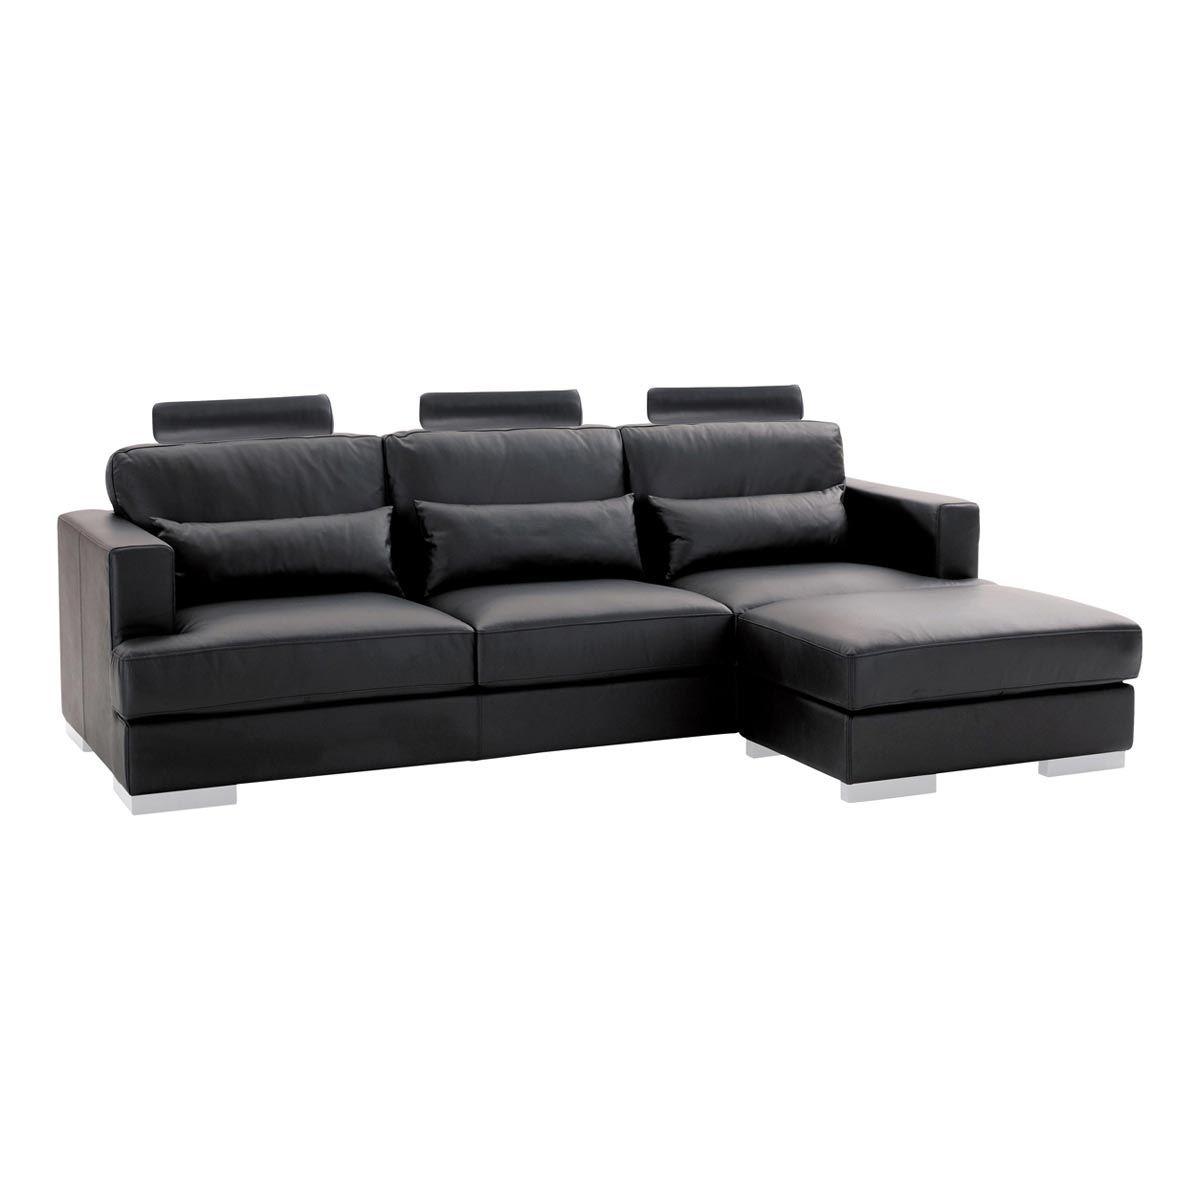 Canapé d angle 5 places fixe cuir noir ORLANDO